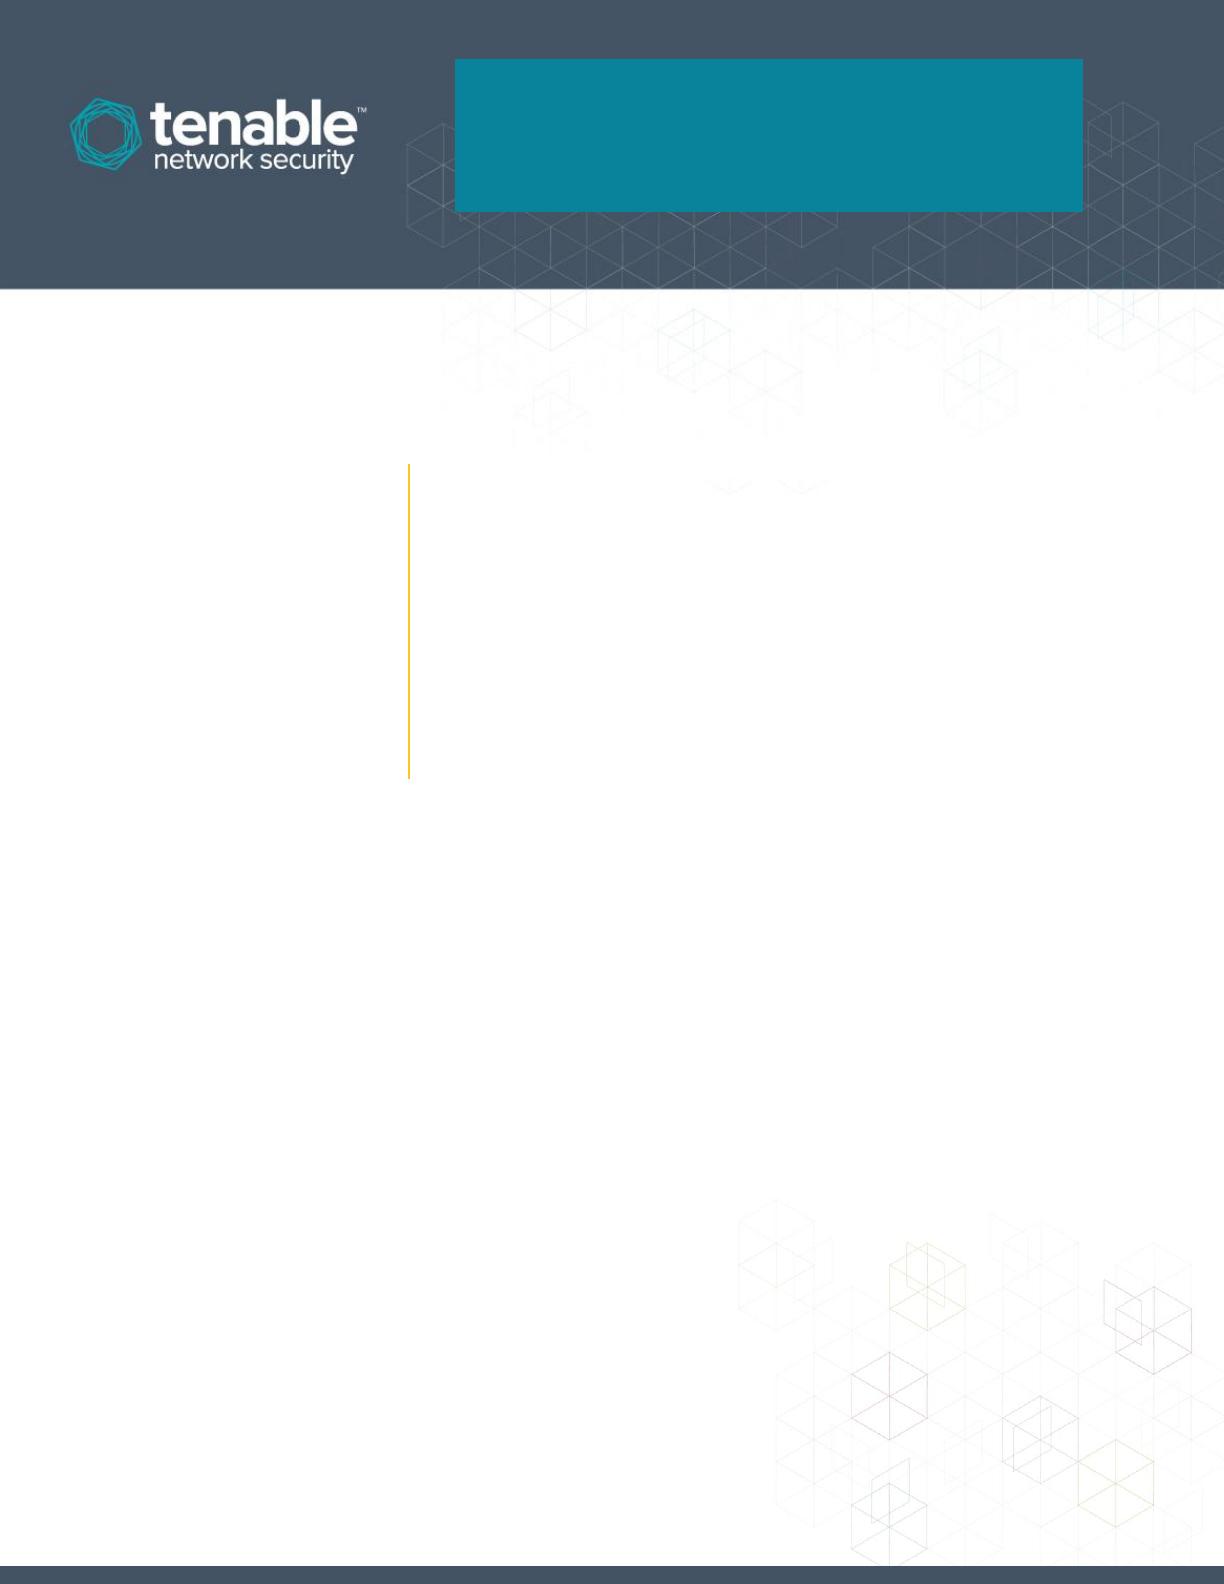 Nessus Enterprise For Amazon Web Services (AWS) Installation